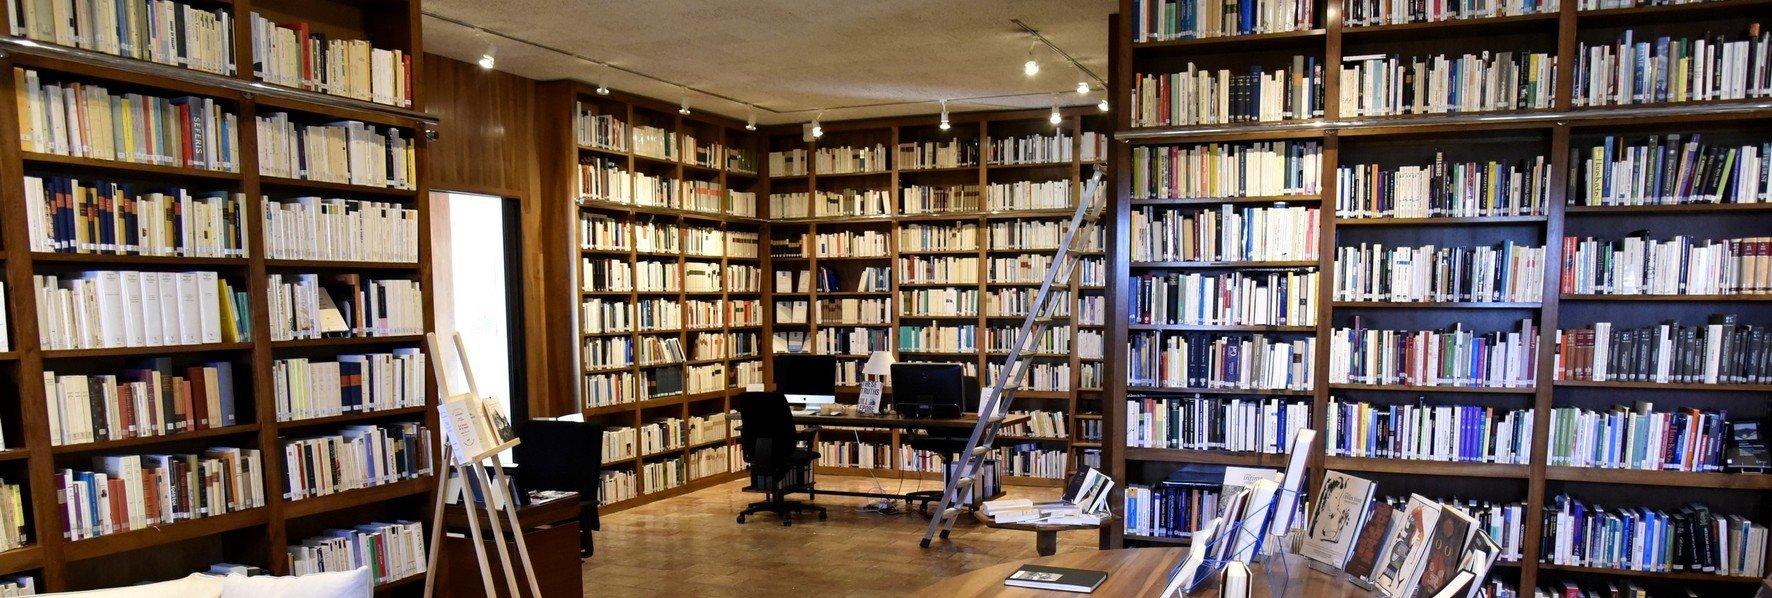 Bibliothèque Grande maison © Olivier Monoyez